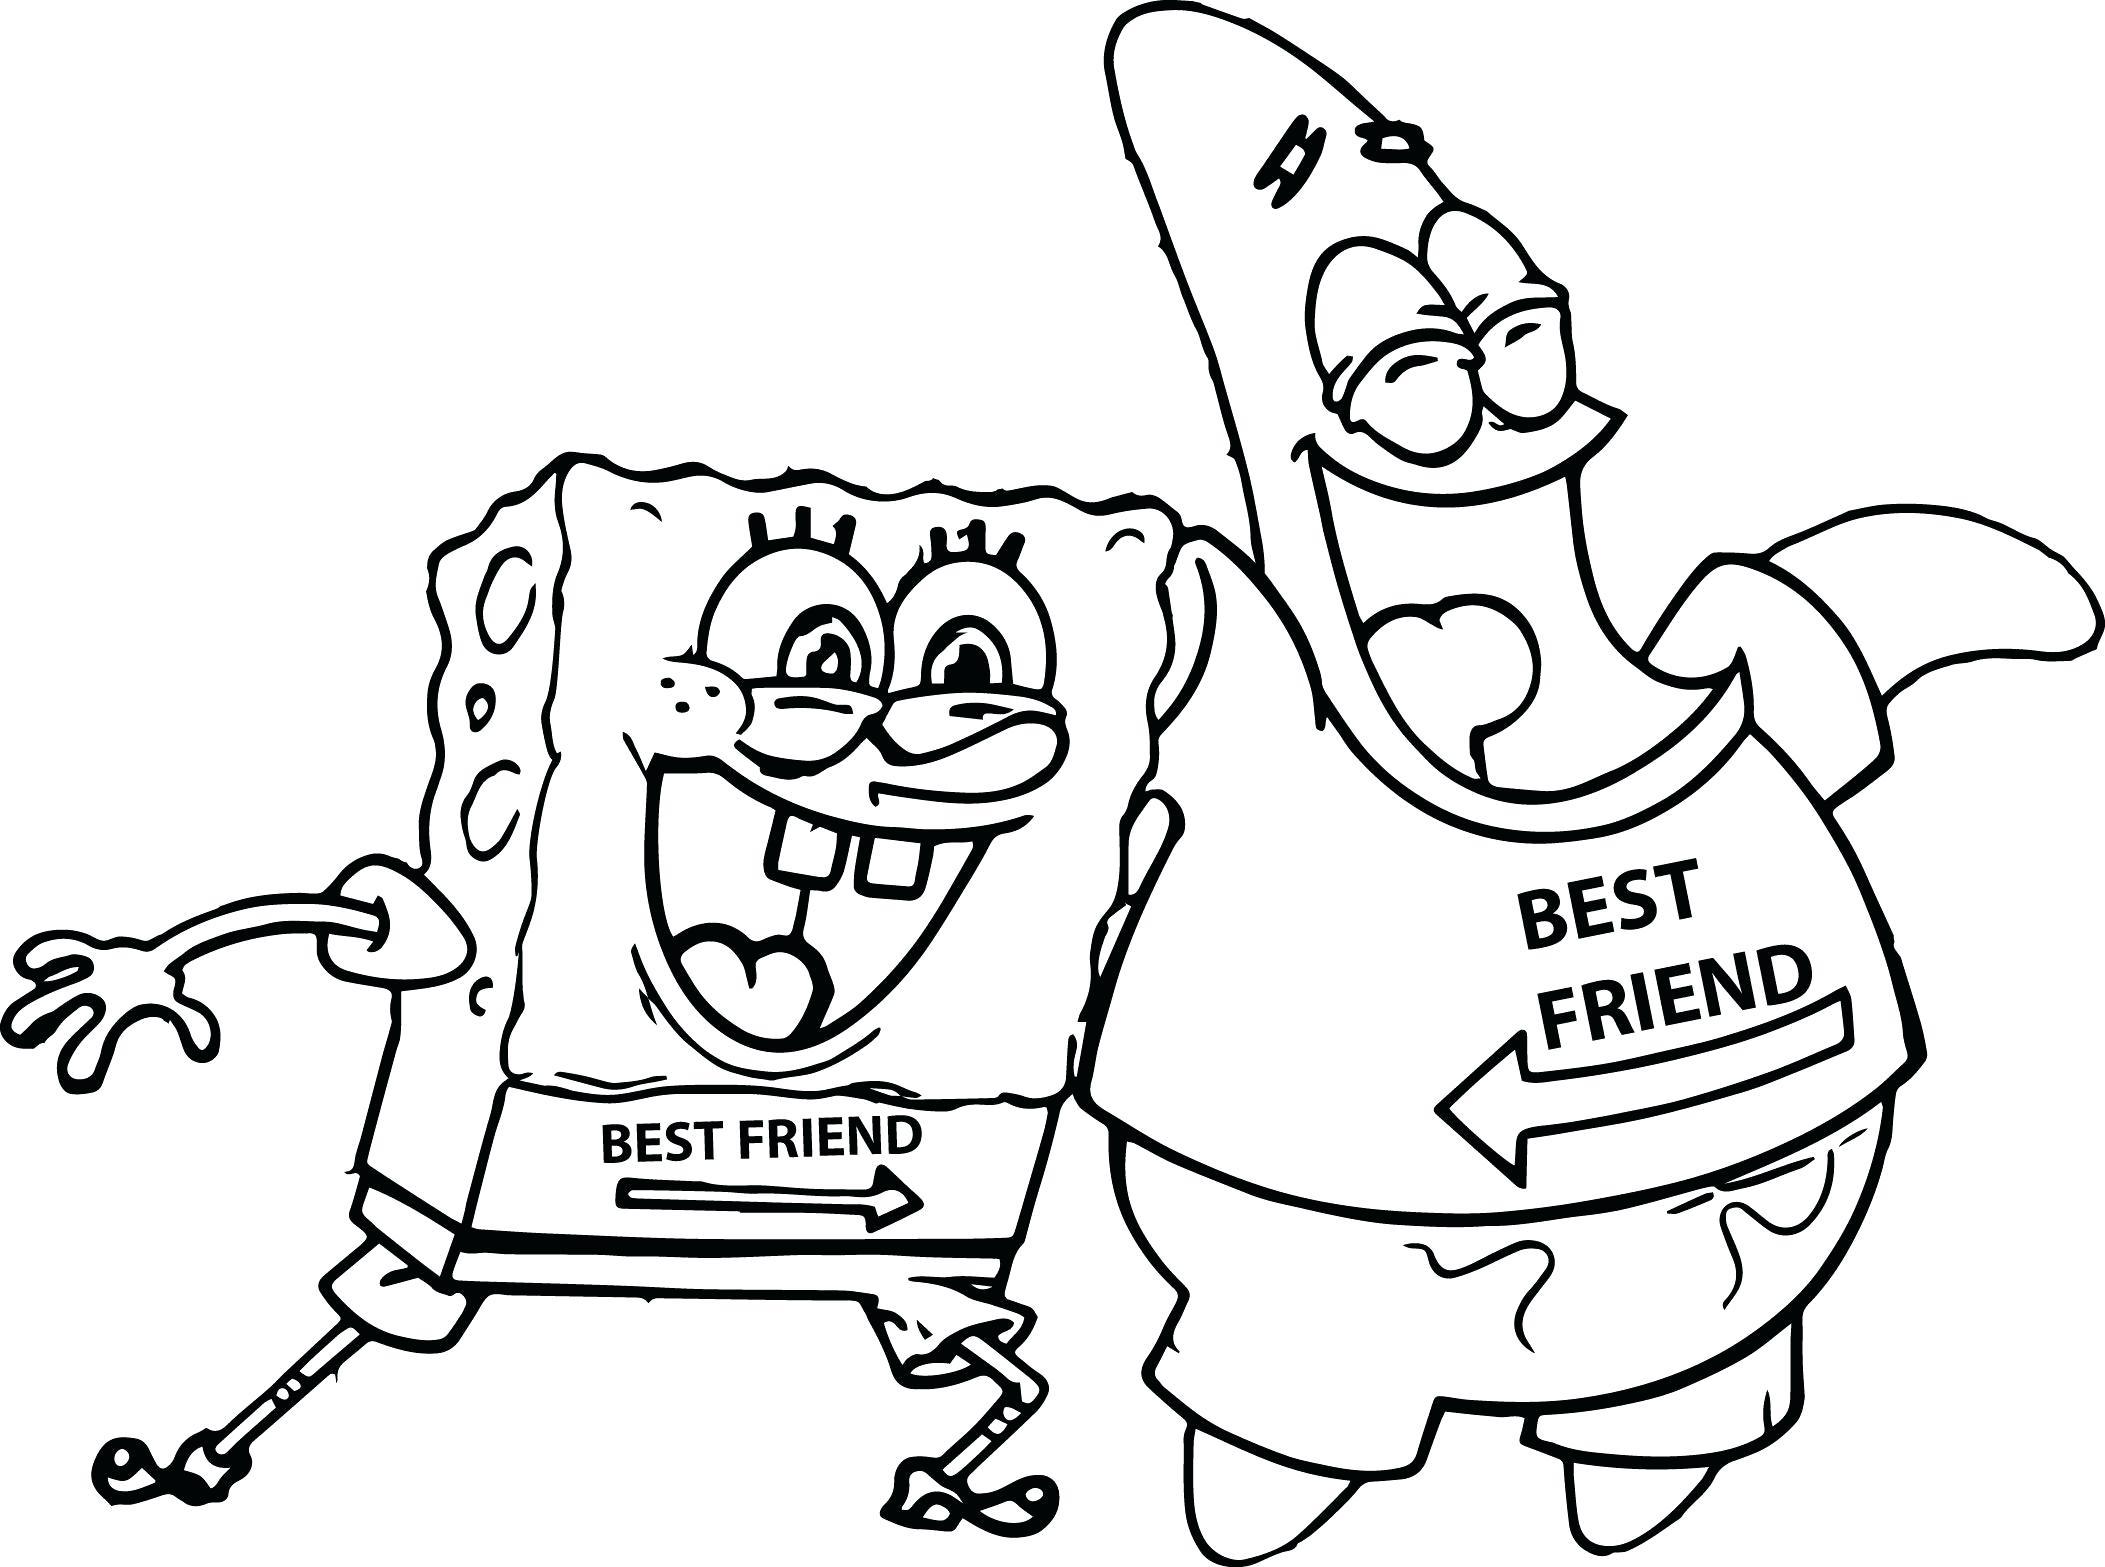 2105x1567 Cartoon Coloring Pages Spongebob Patrick Star New